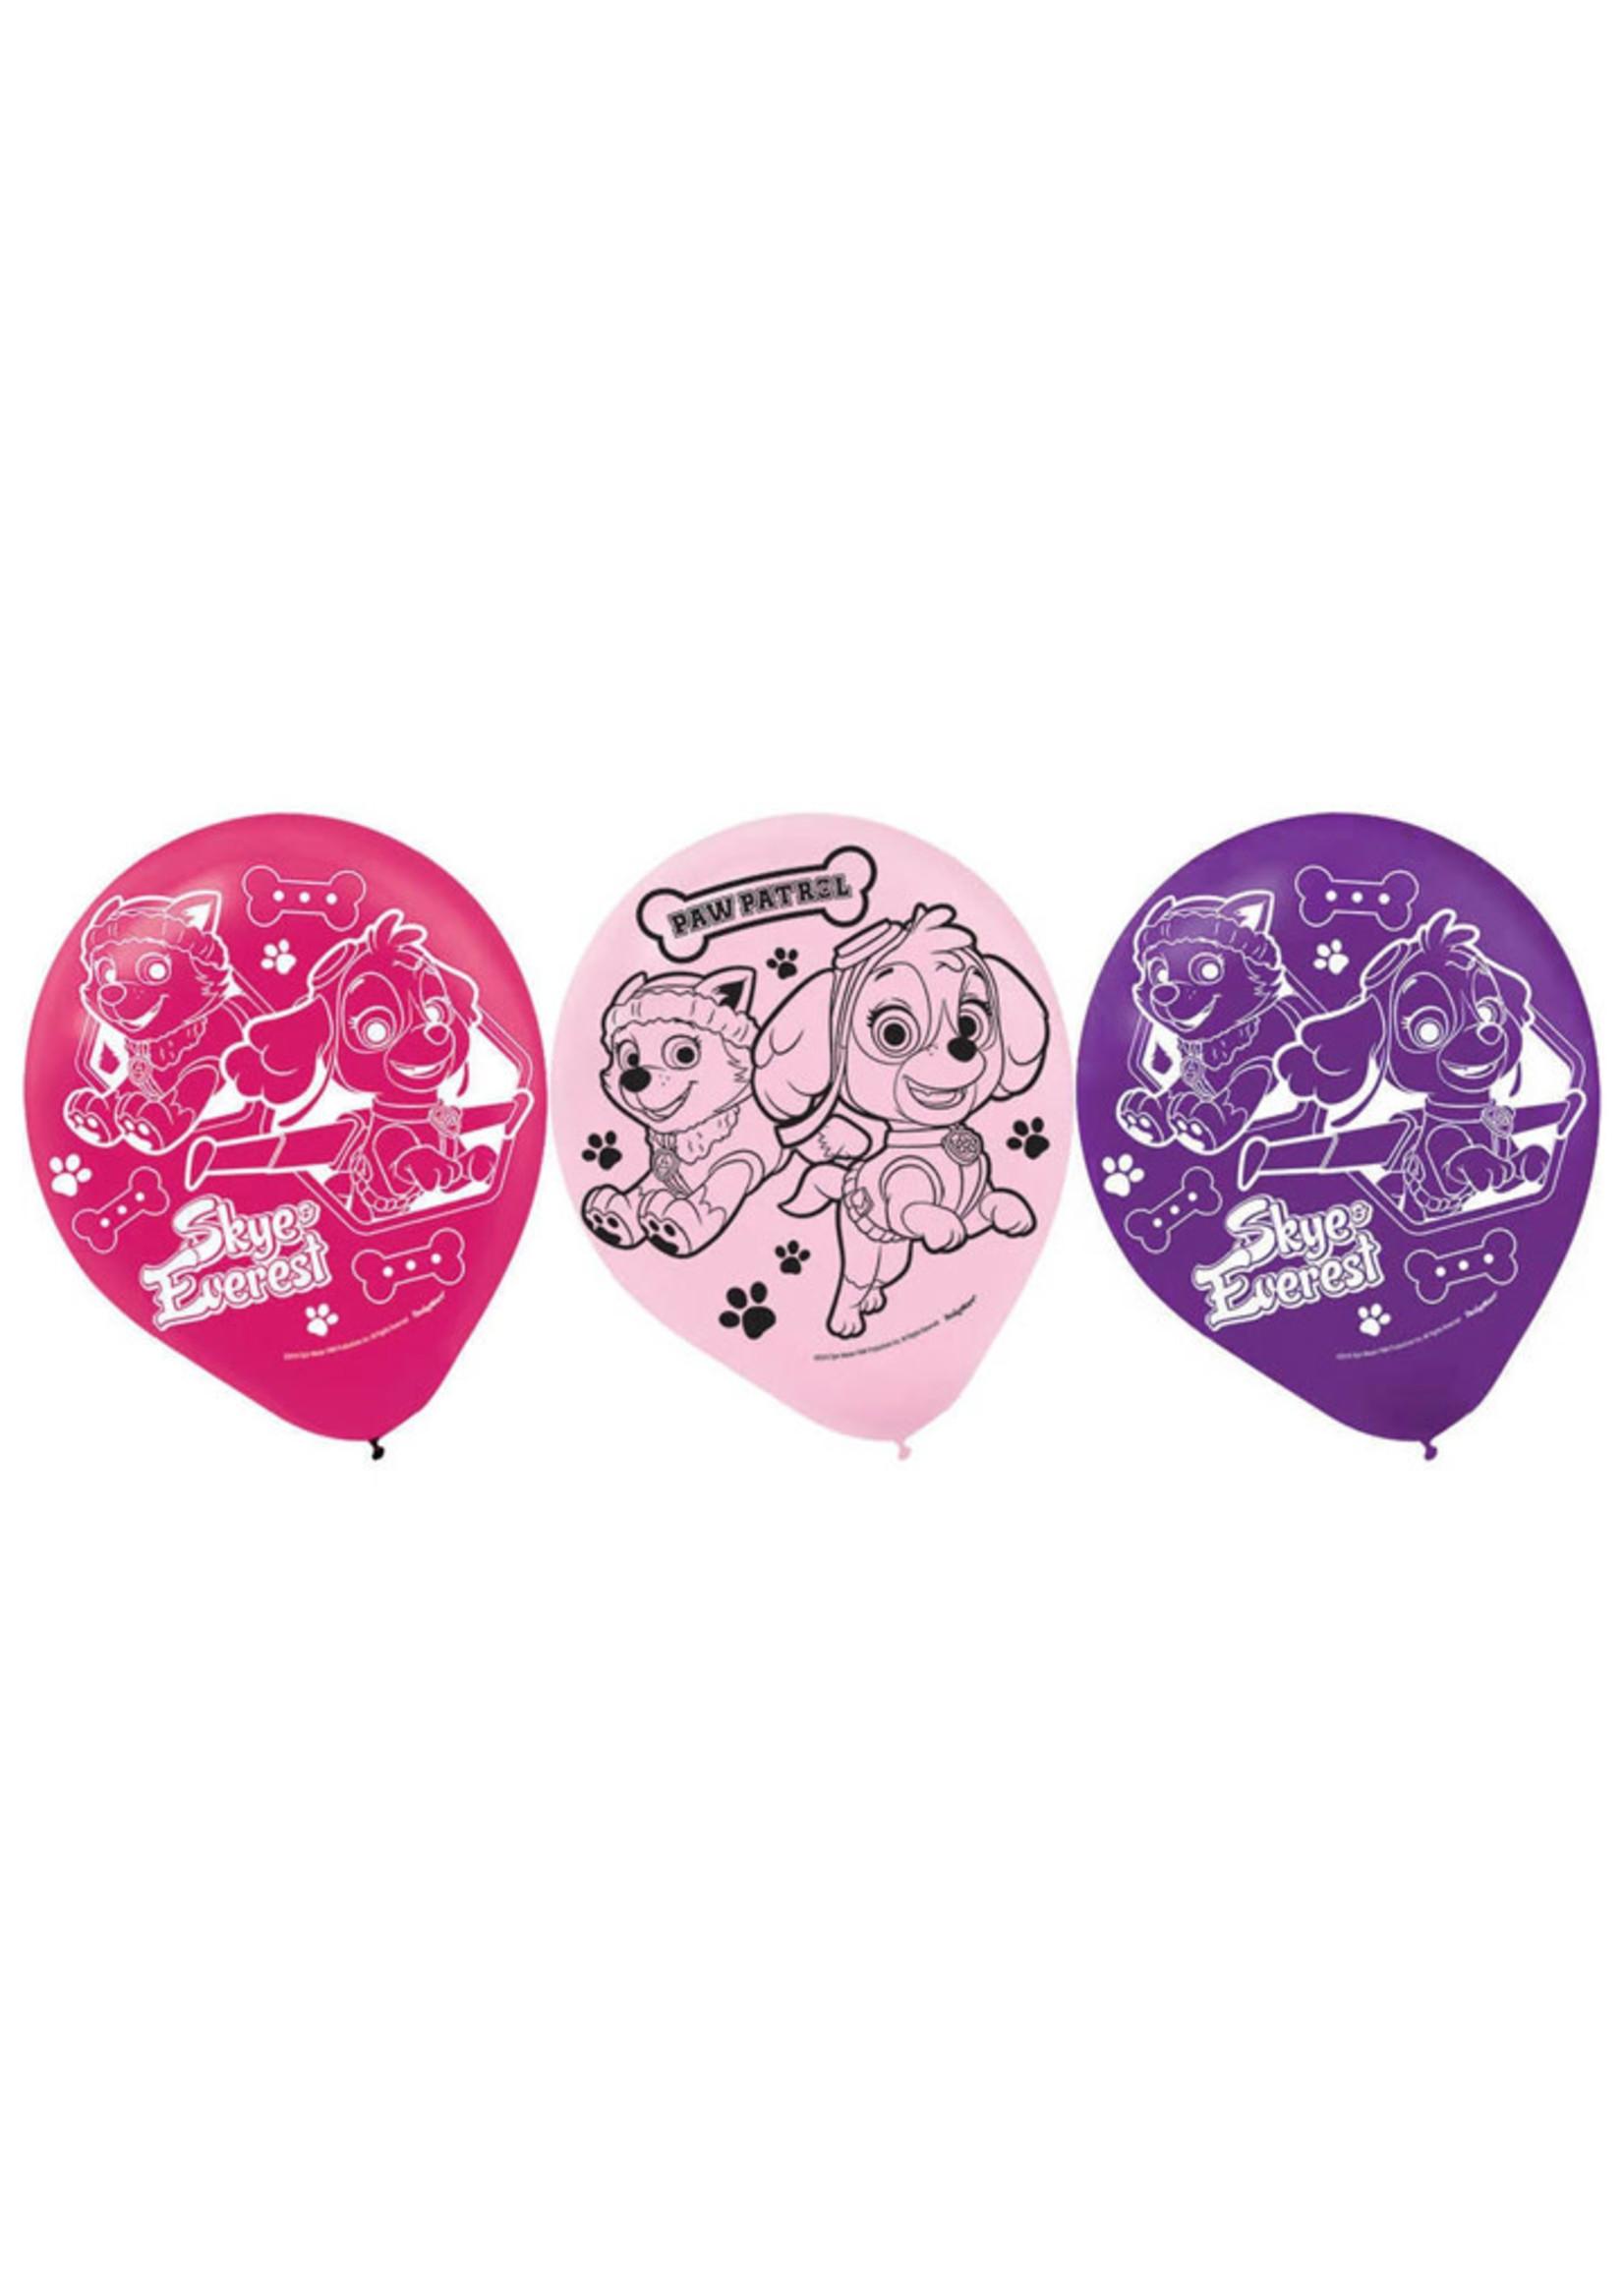 "Paw Patrol Girl 12"" Latex Balloons - 6ct"